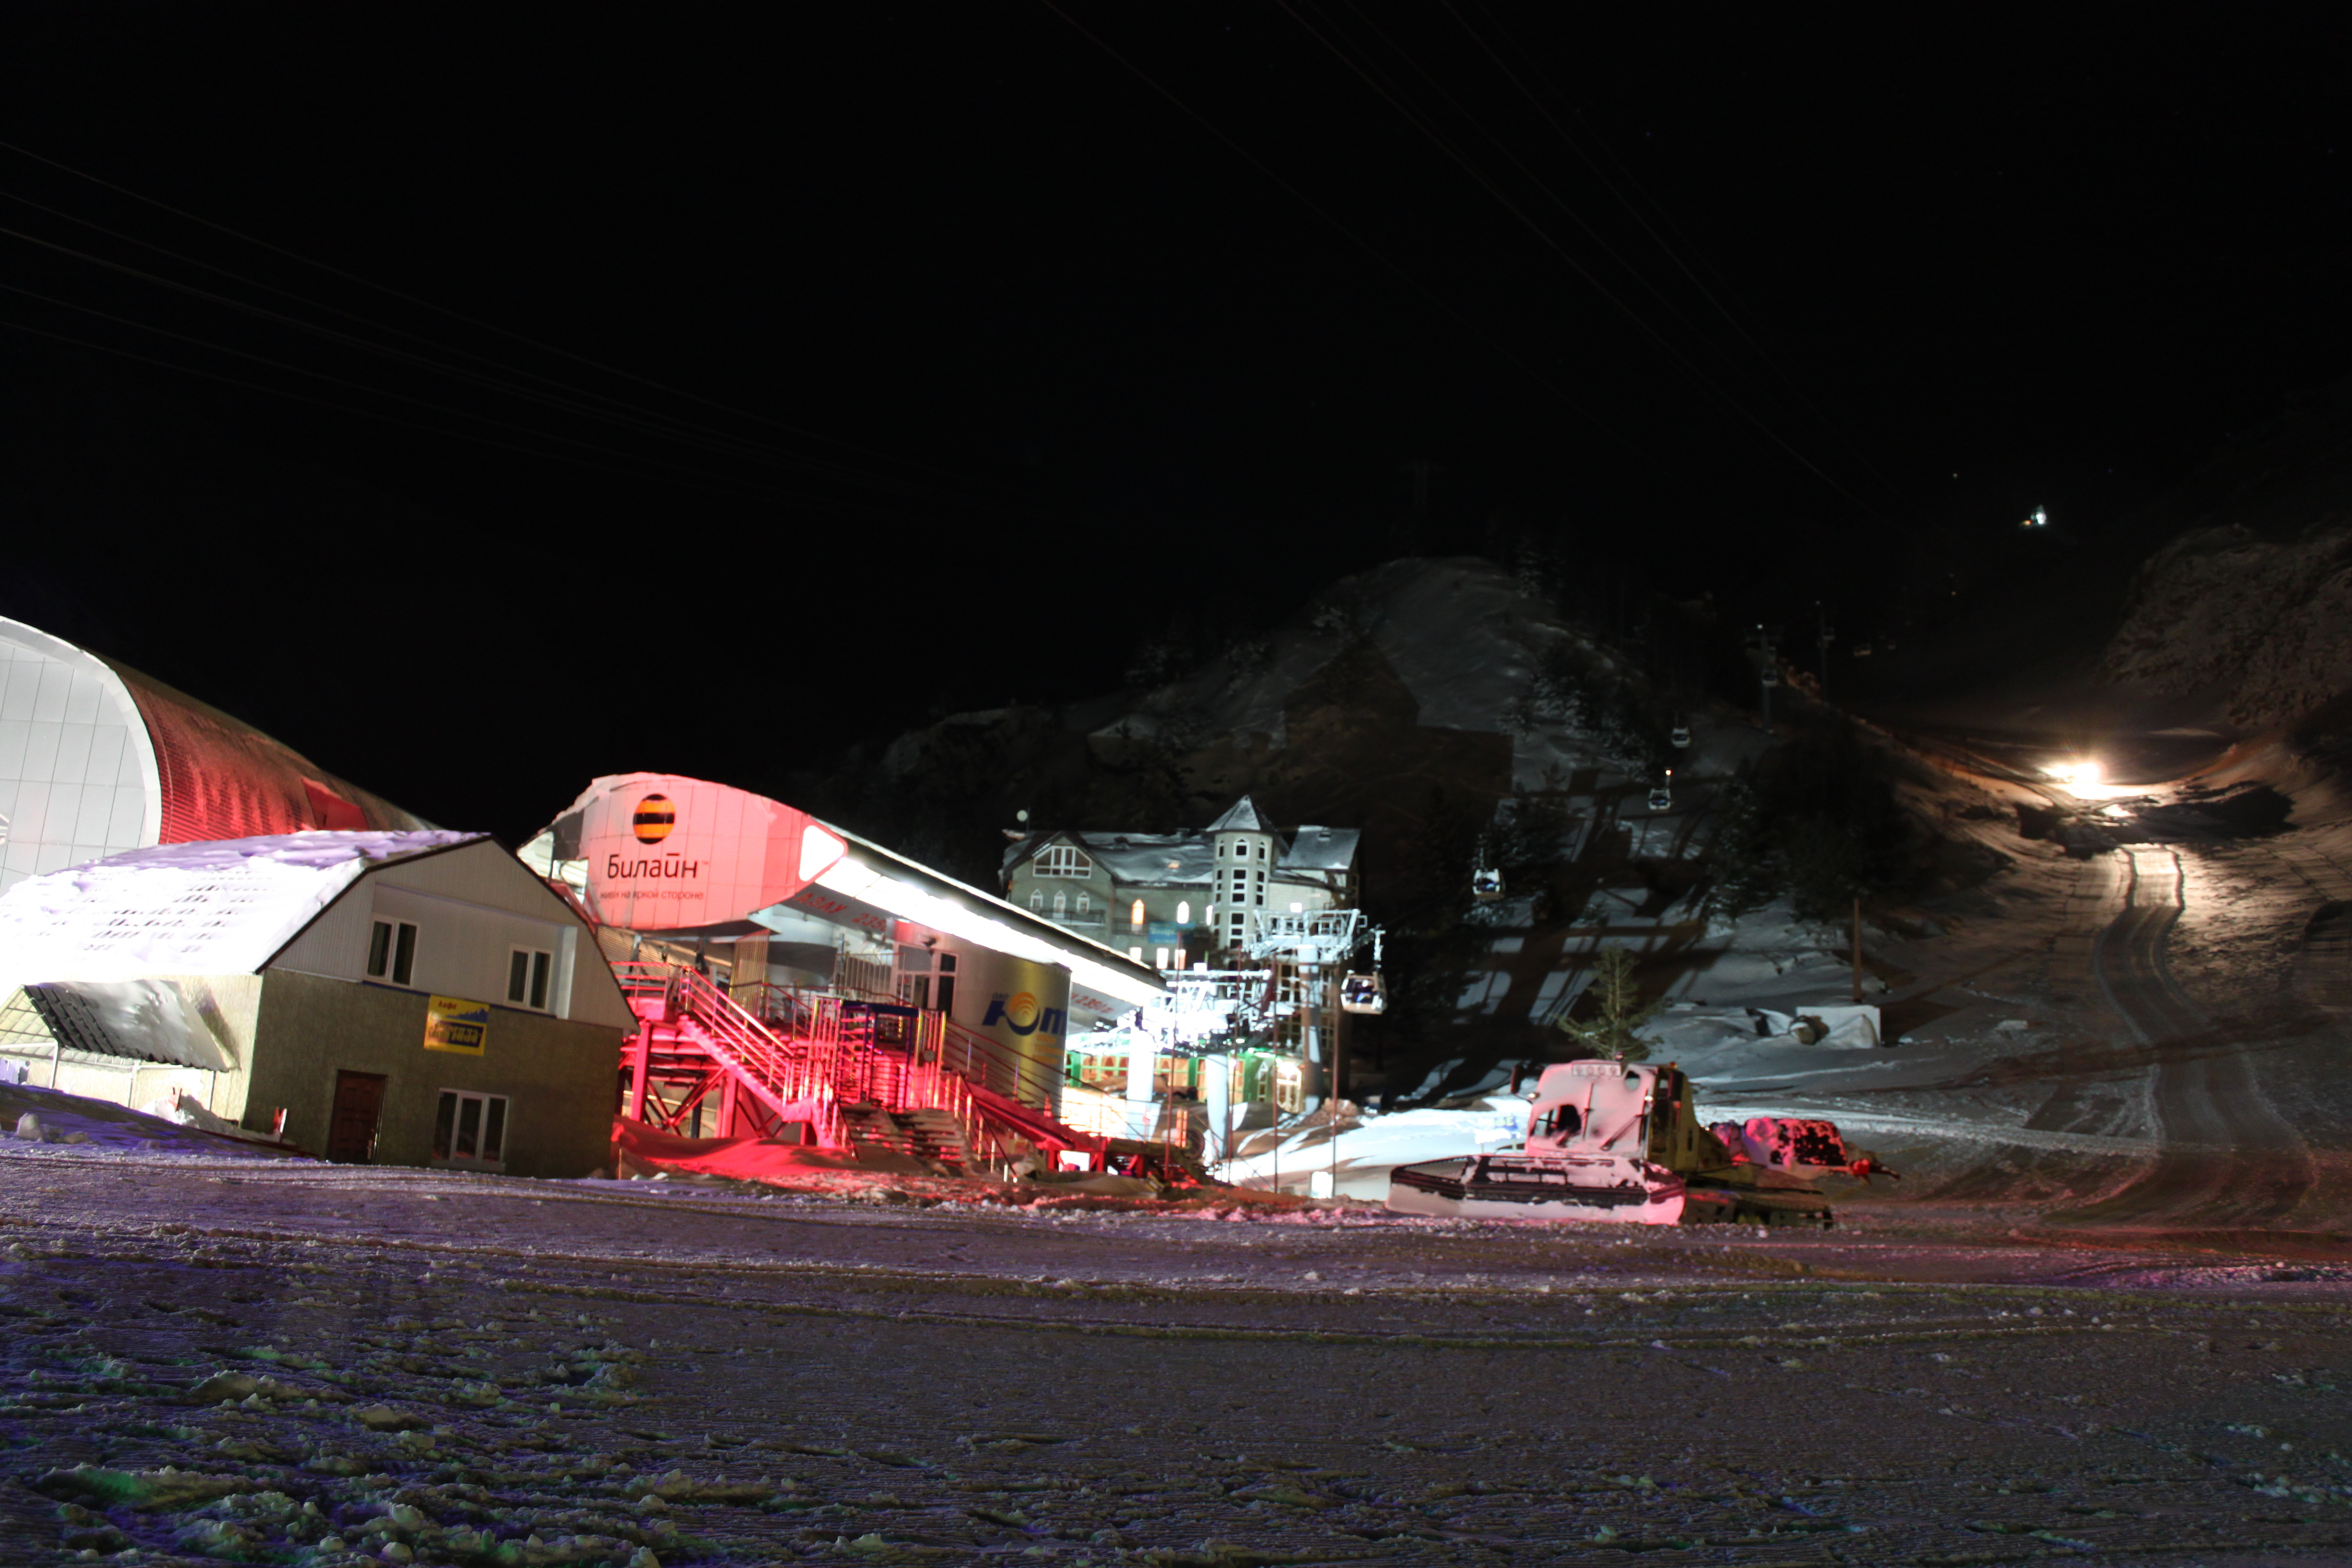 Azau in the night, Mt Elbrus